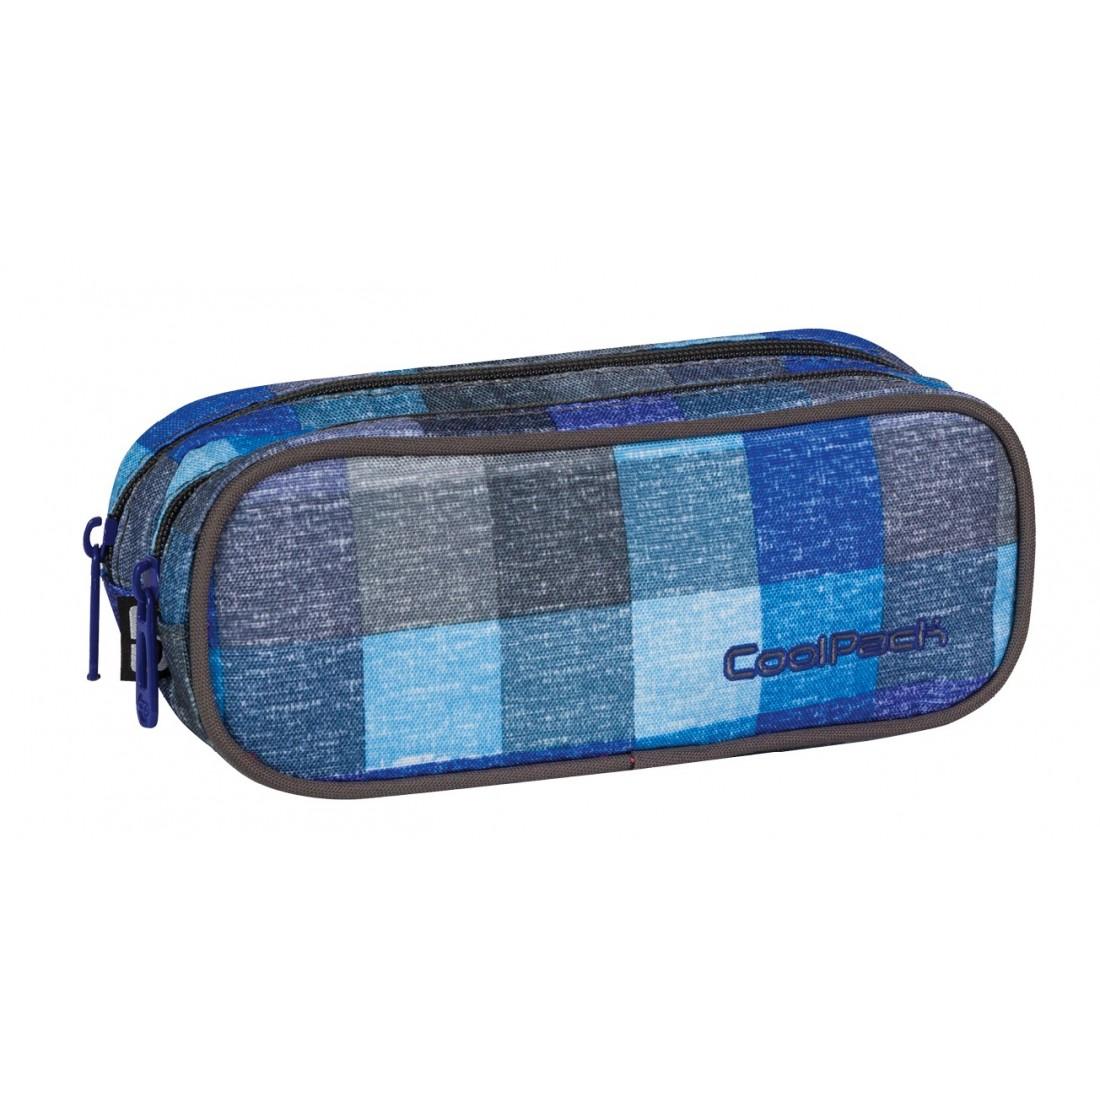 Saszetka podwójna CoolPack CLEVER BLUE SHADES CP 404 - plecak-tornister.pl